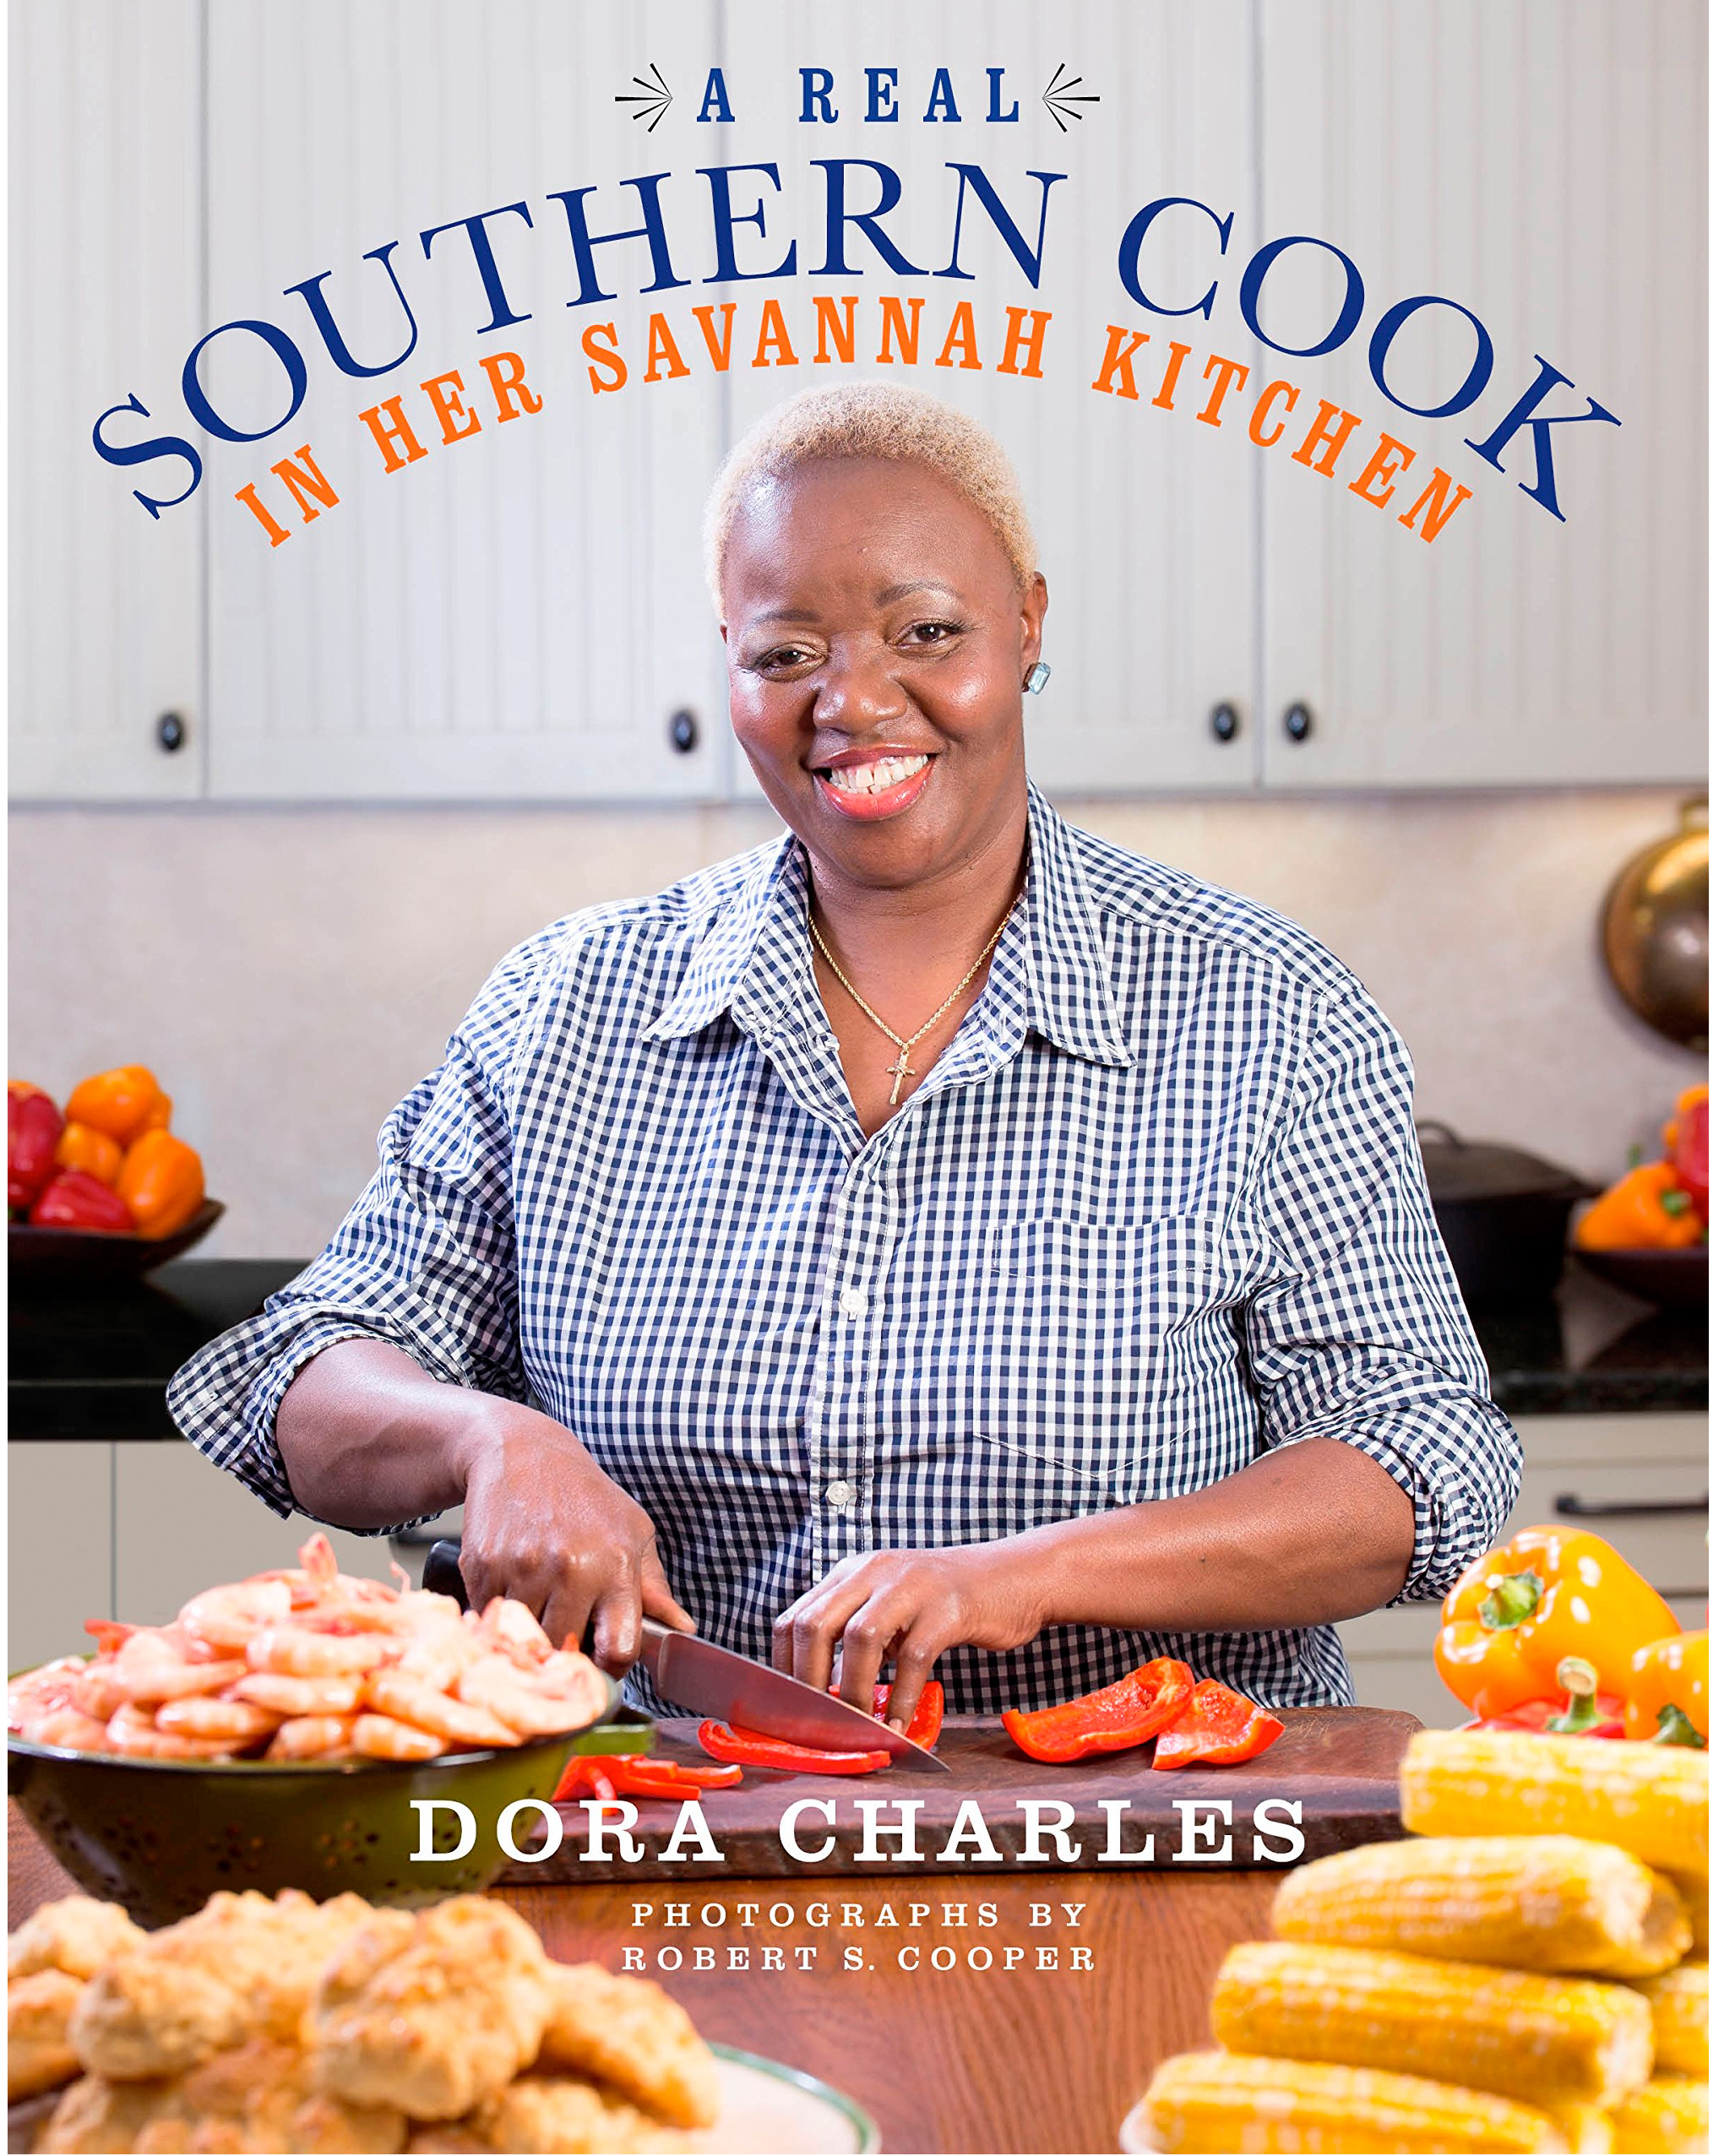 newlywed-cookbooks-southern-cook-1015.jpg